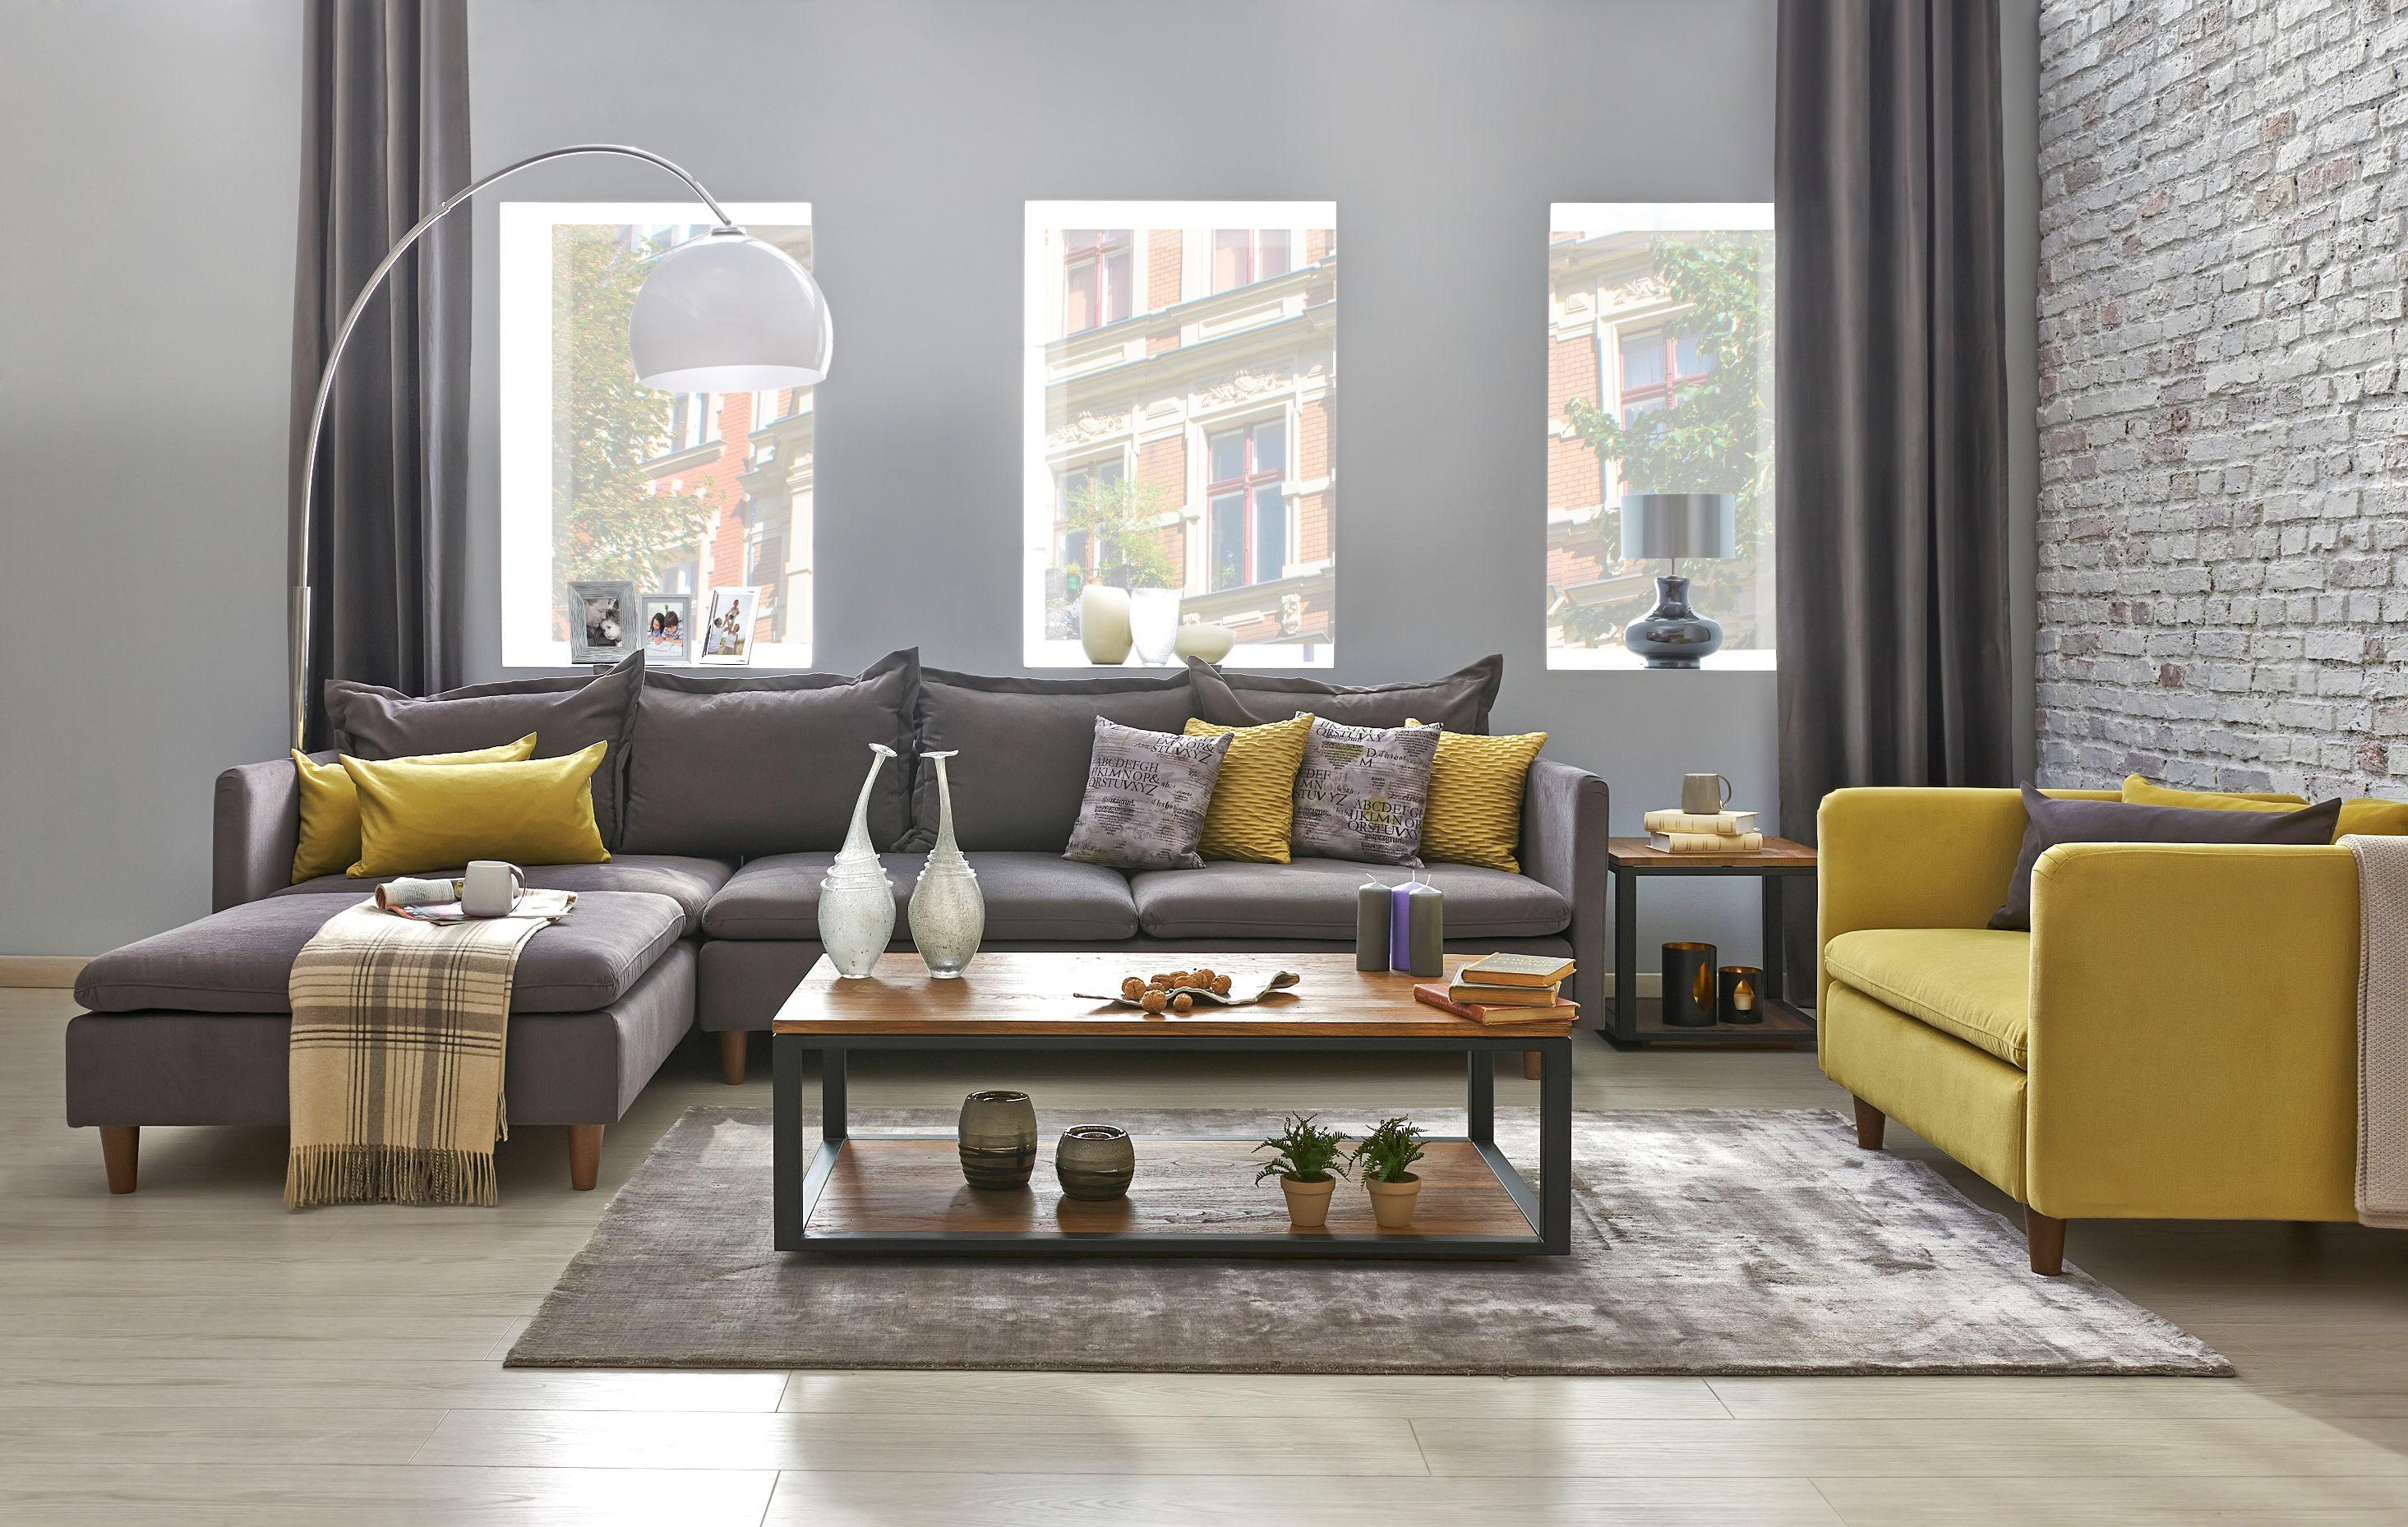 Tepe Home Koltuk Takimi 2015 2016 Modelleri 3 Oturma Odasi Dekorasyonu Oturma Odasi Tasarimlari Oturma Odasi Fikirleri